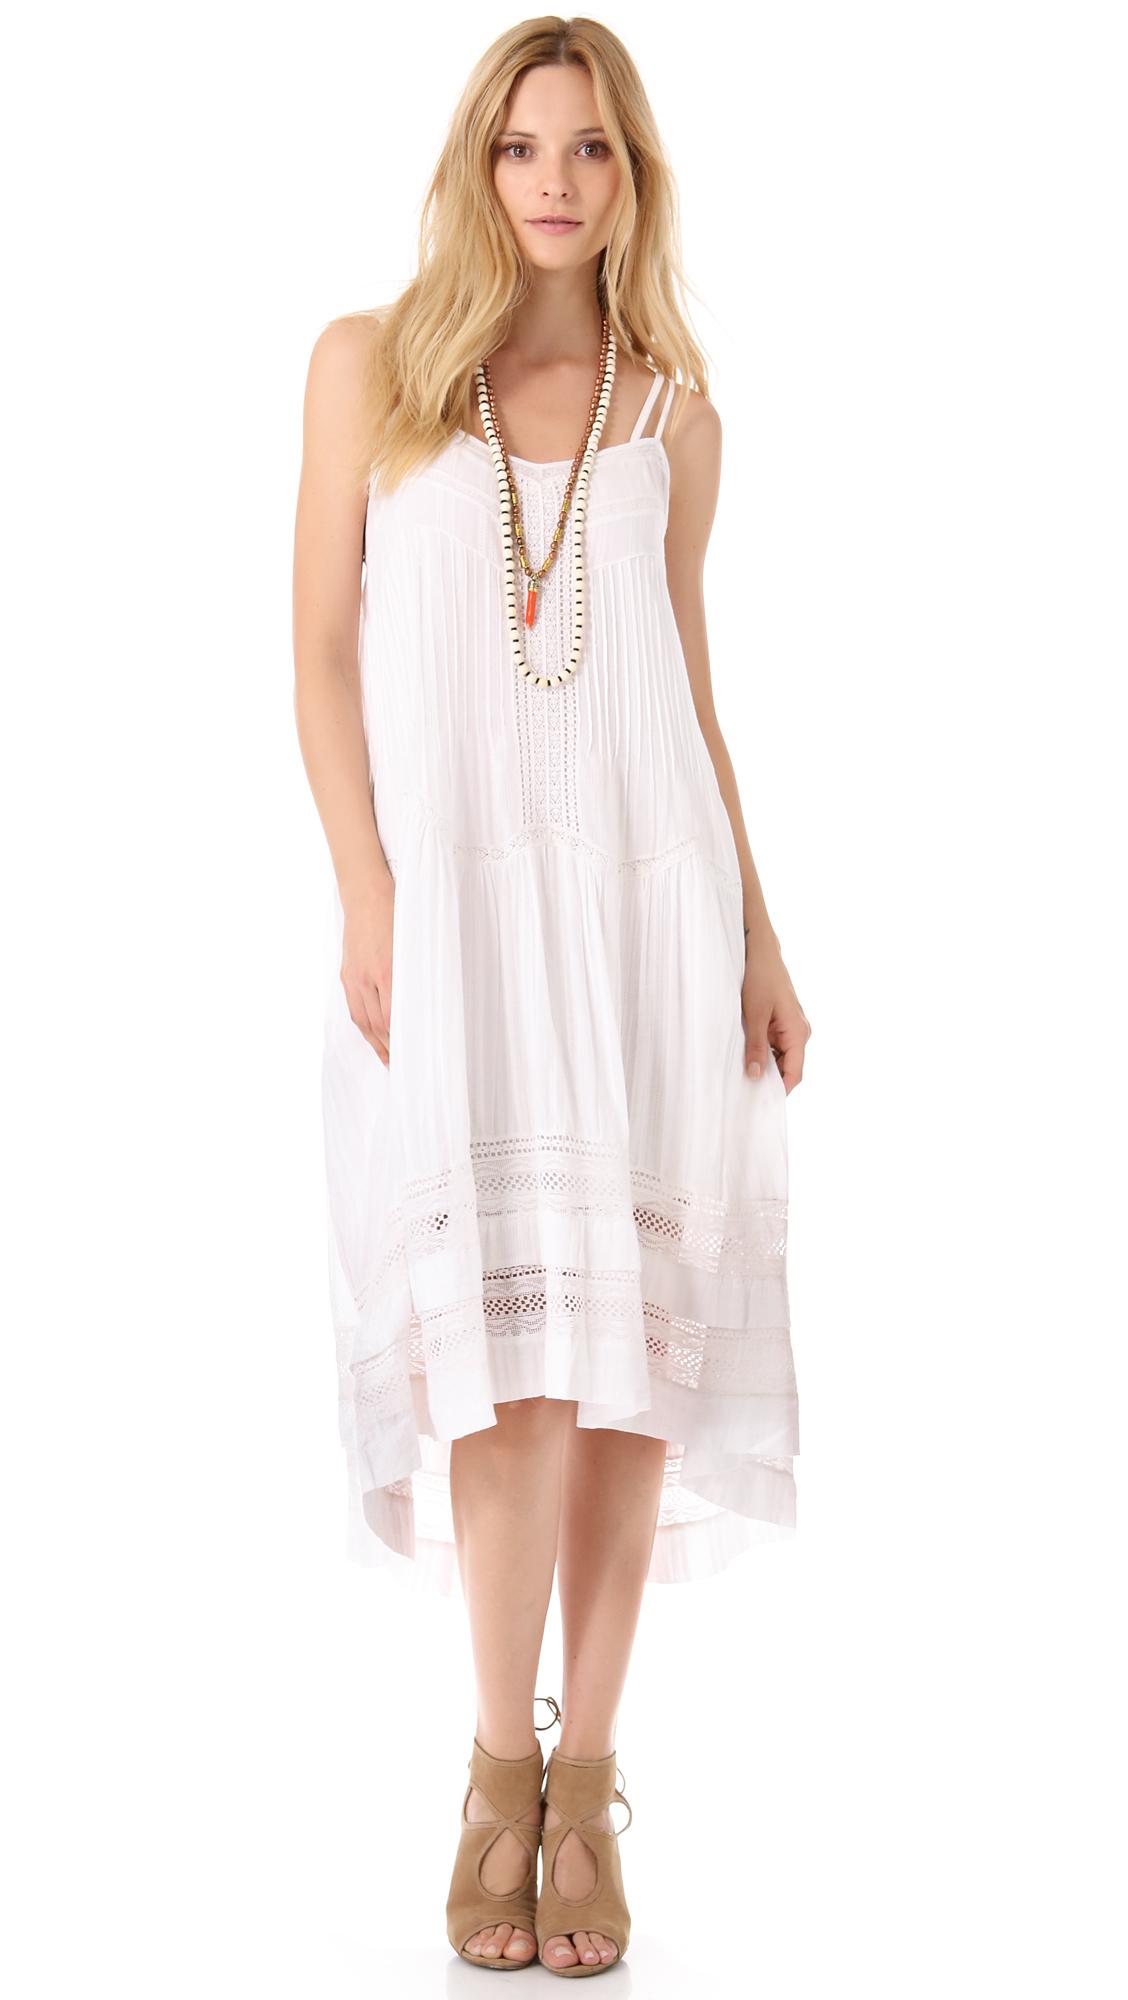 lyst twelfth street cynthia vincent western lace dress